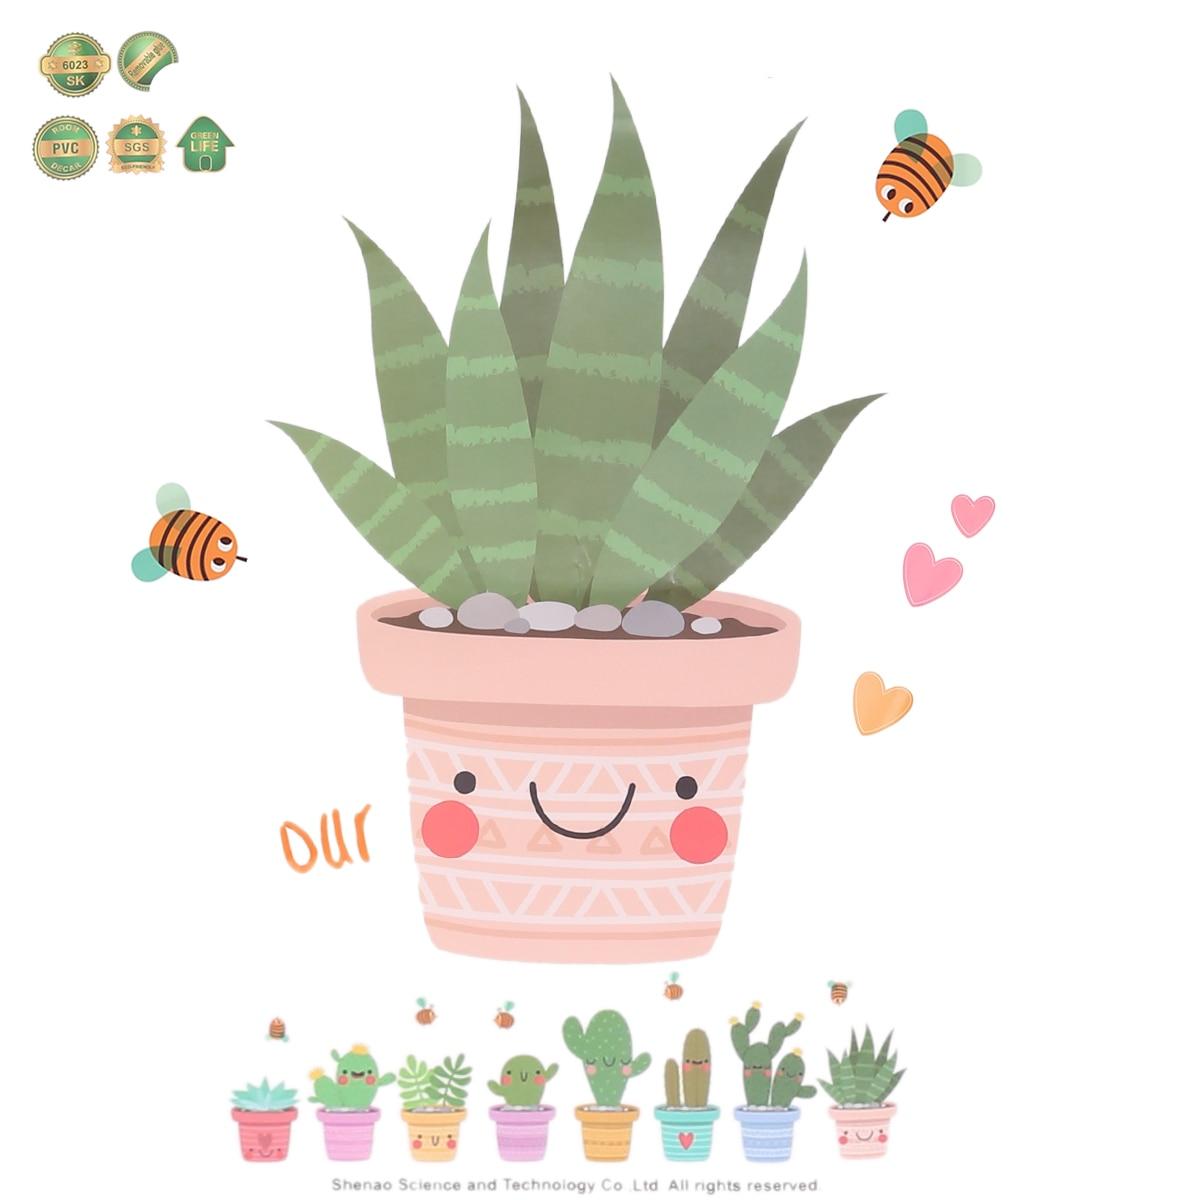 Gambar Kaktus Lucu Wallpaper